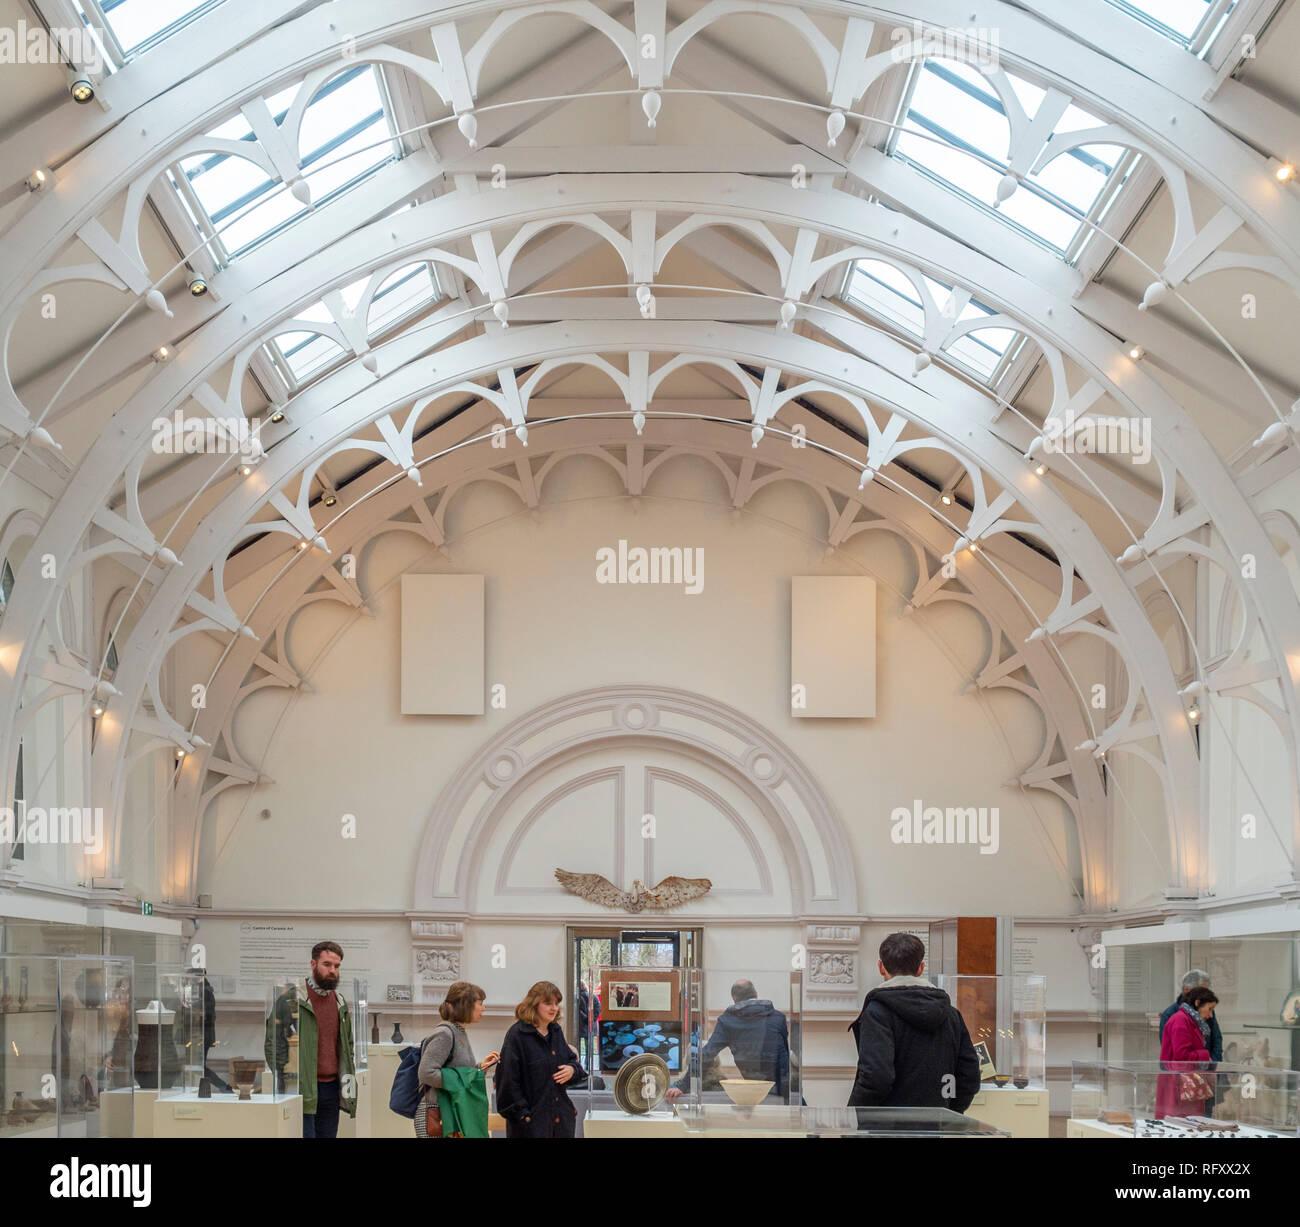 CENTRE OF CERAMIC ART (COCA), York Art Gallery. - Stock Image